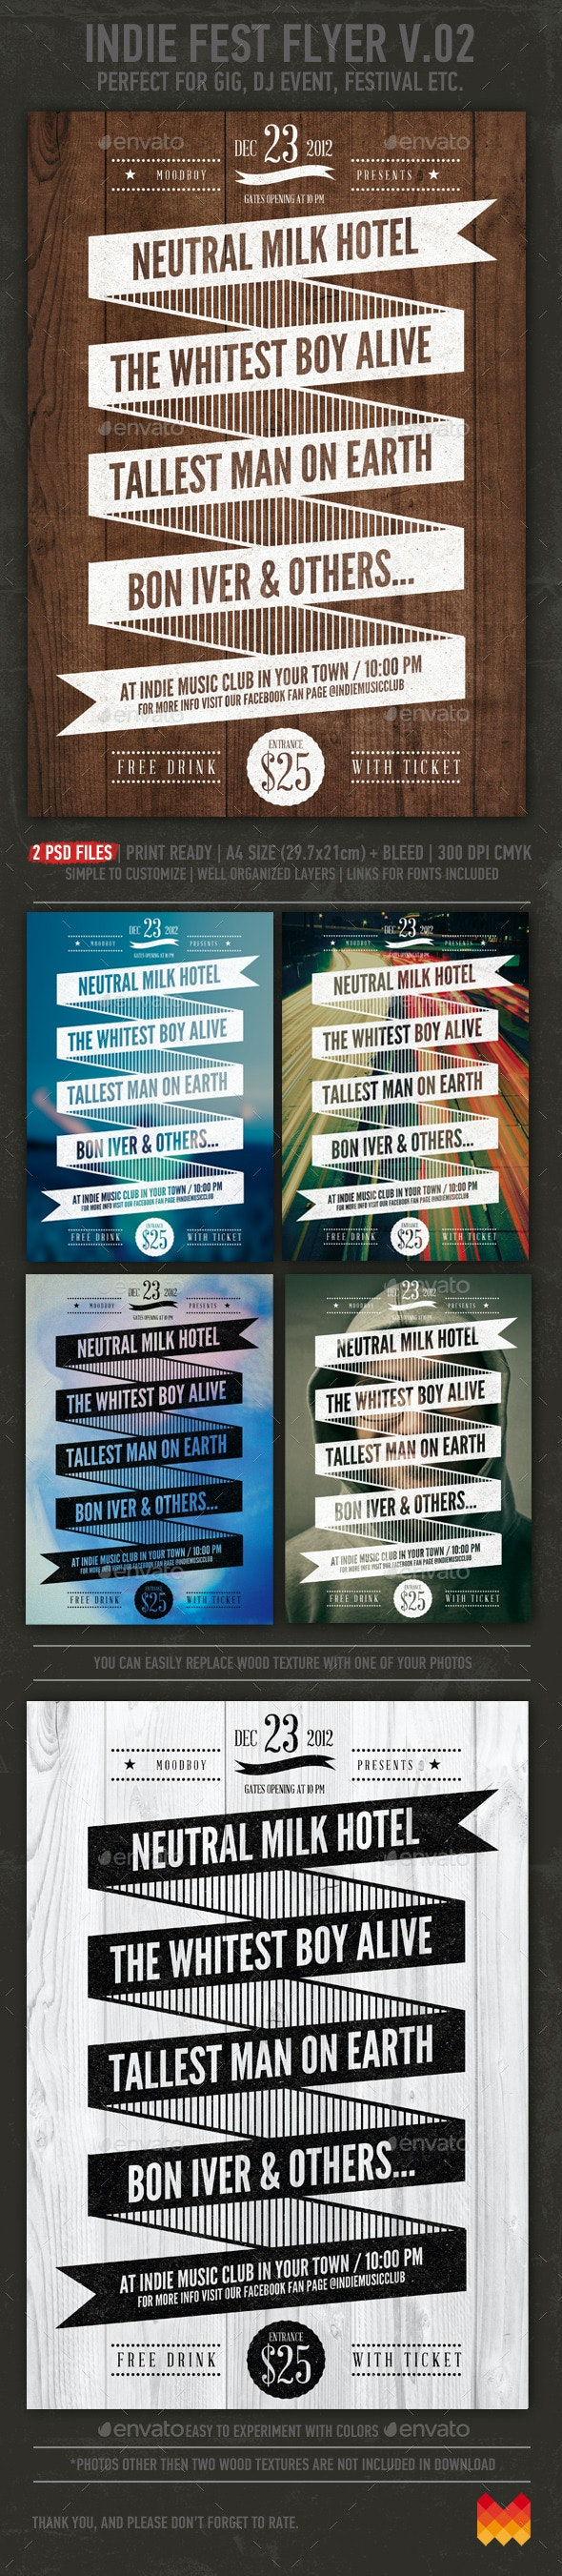 Indie Fest V.02 Flyer / Poster - Events Flyers